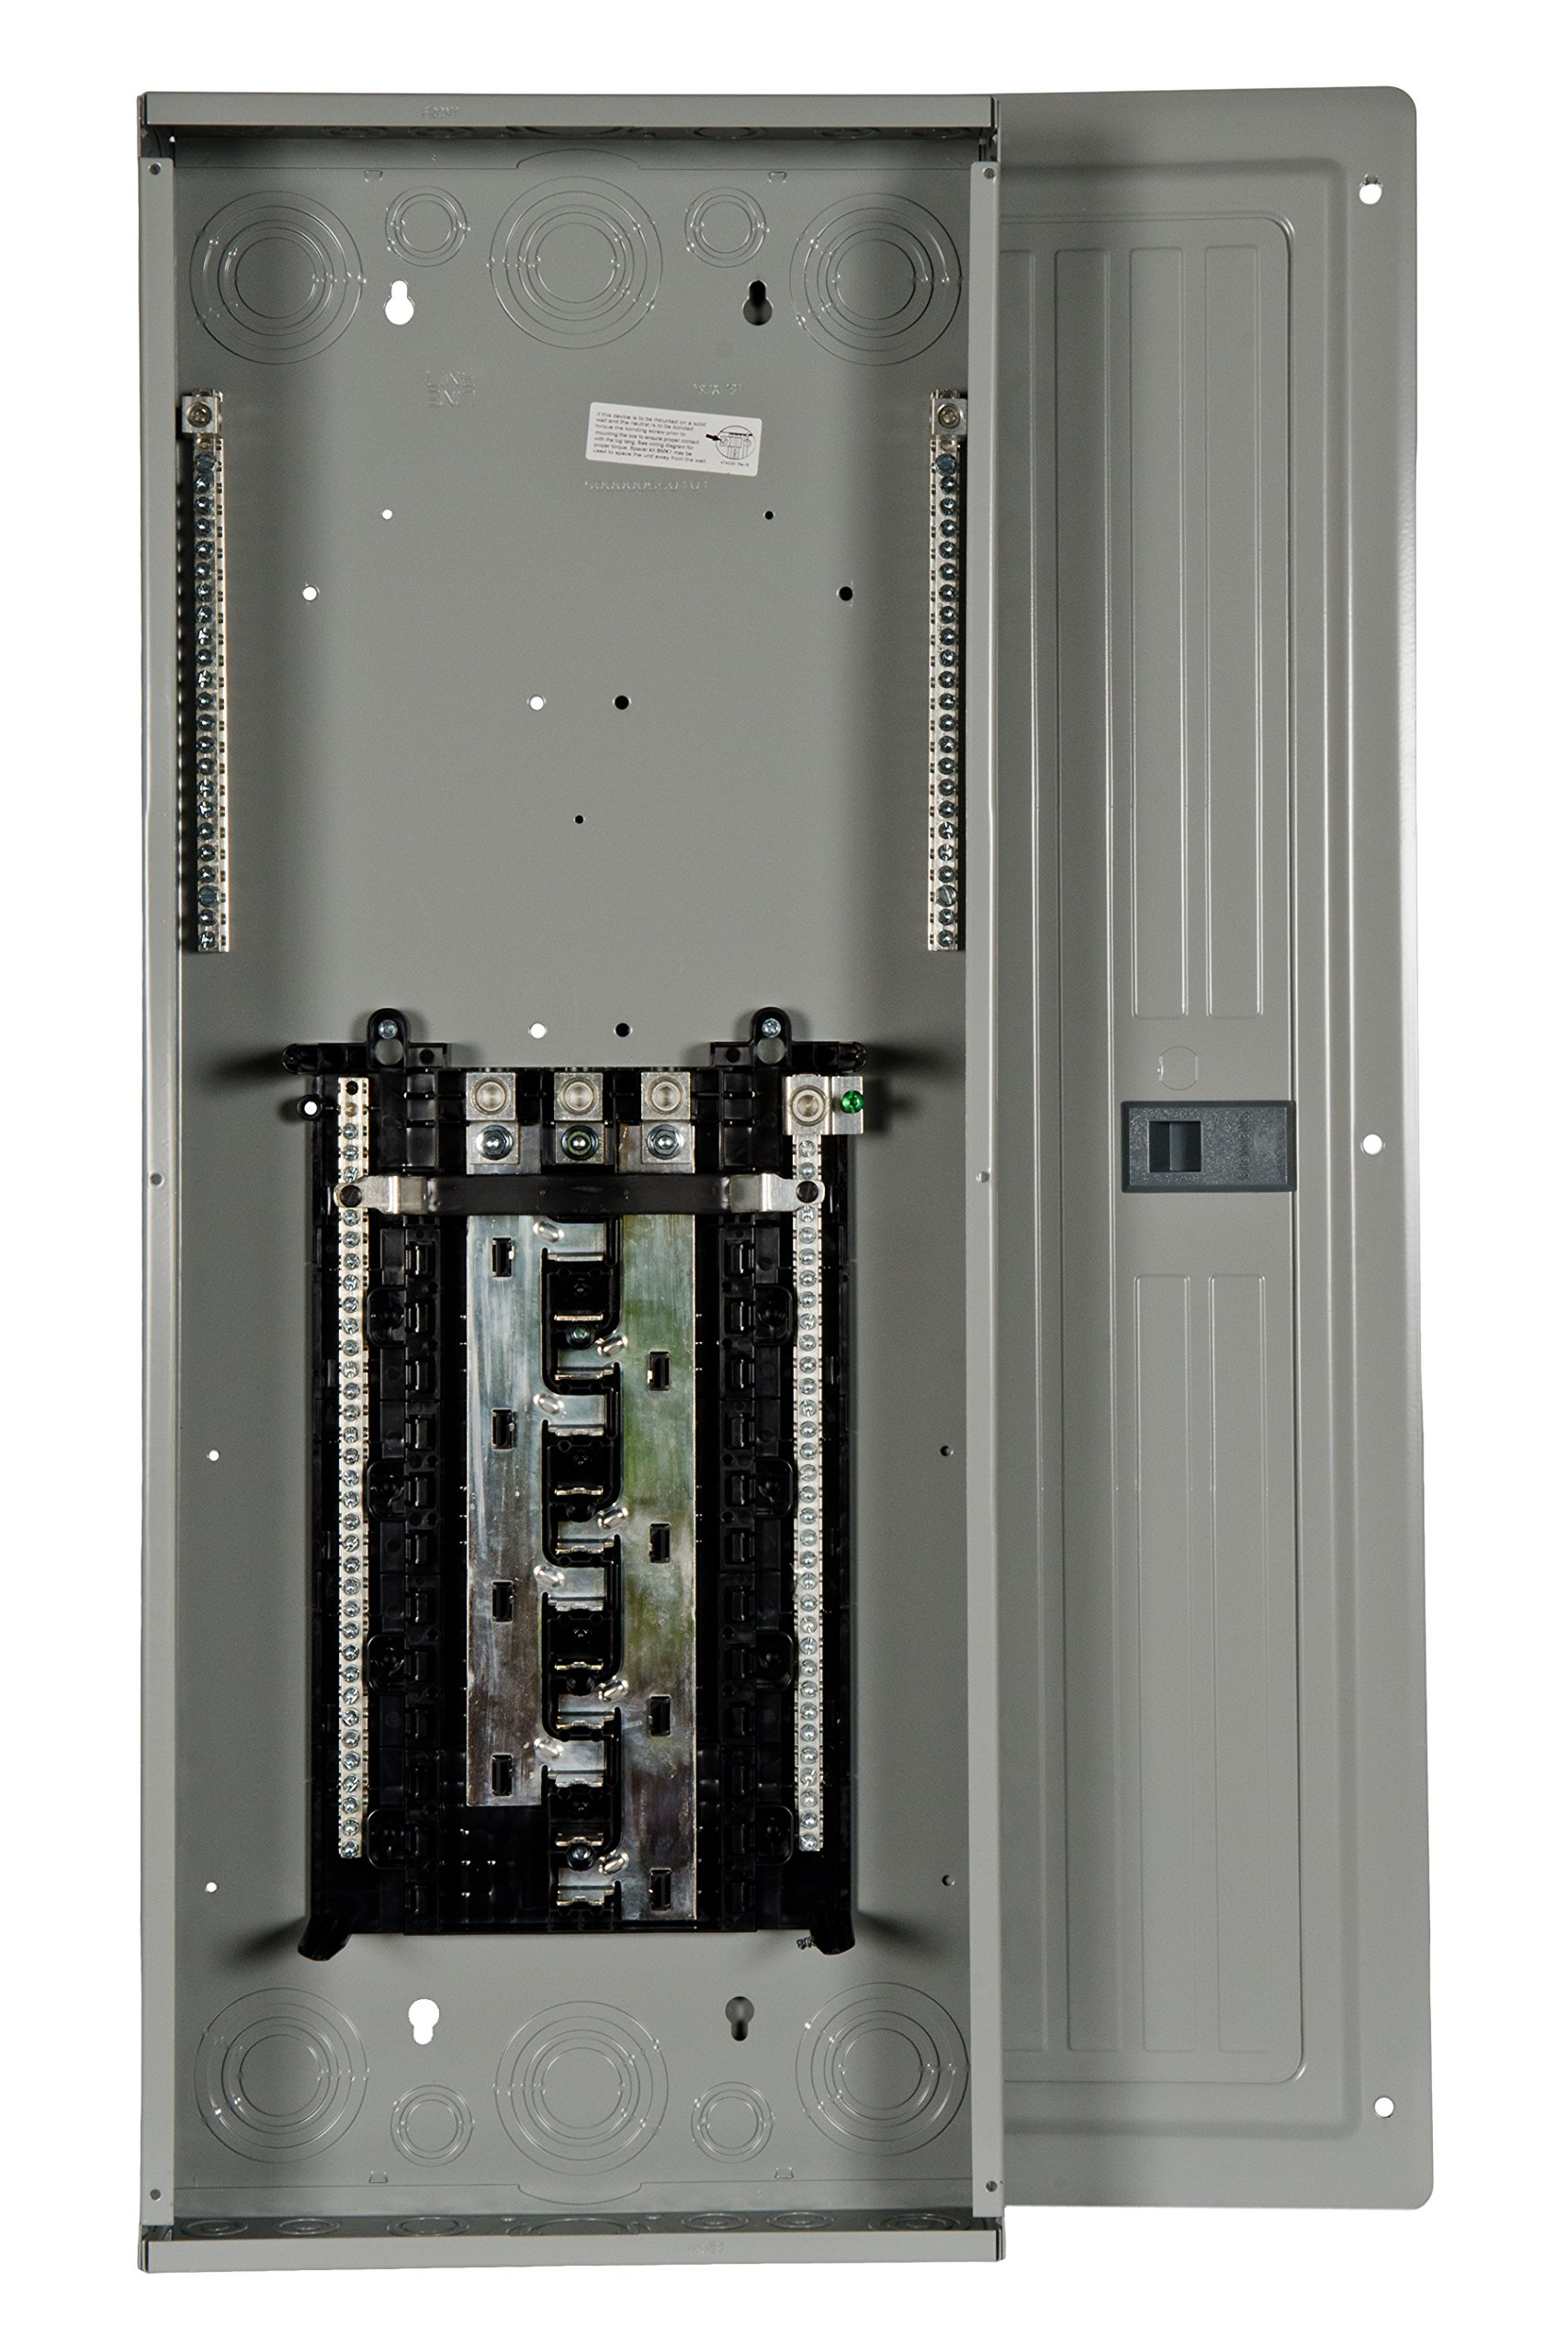 P2442L3200CU 200-Amp 24-Space 42-Circuit 3-Phase Main Lug Load Center